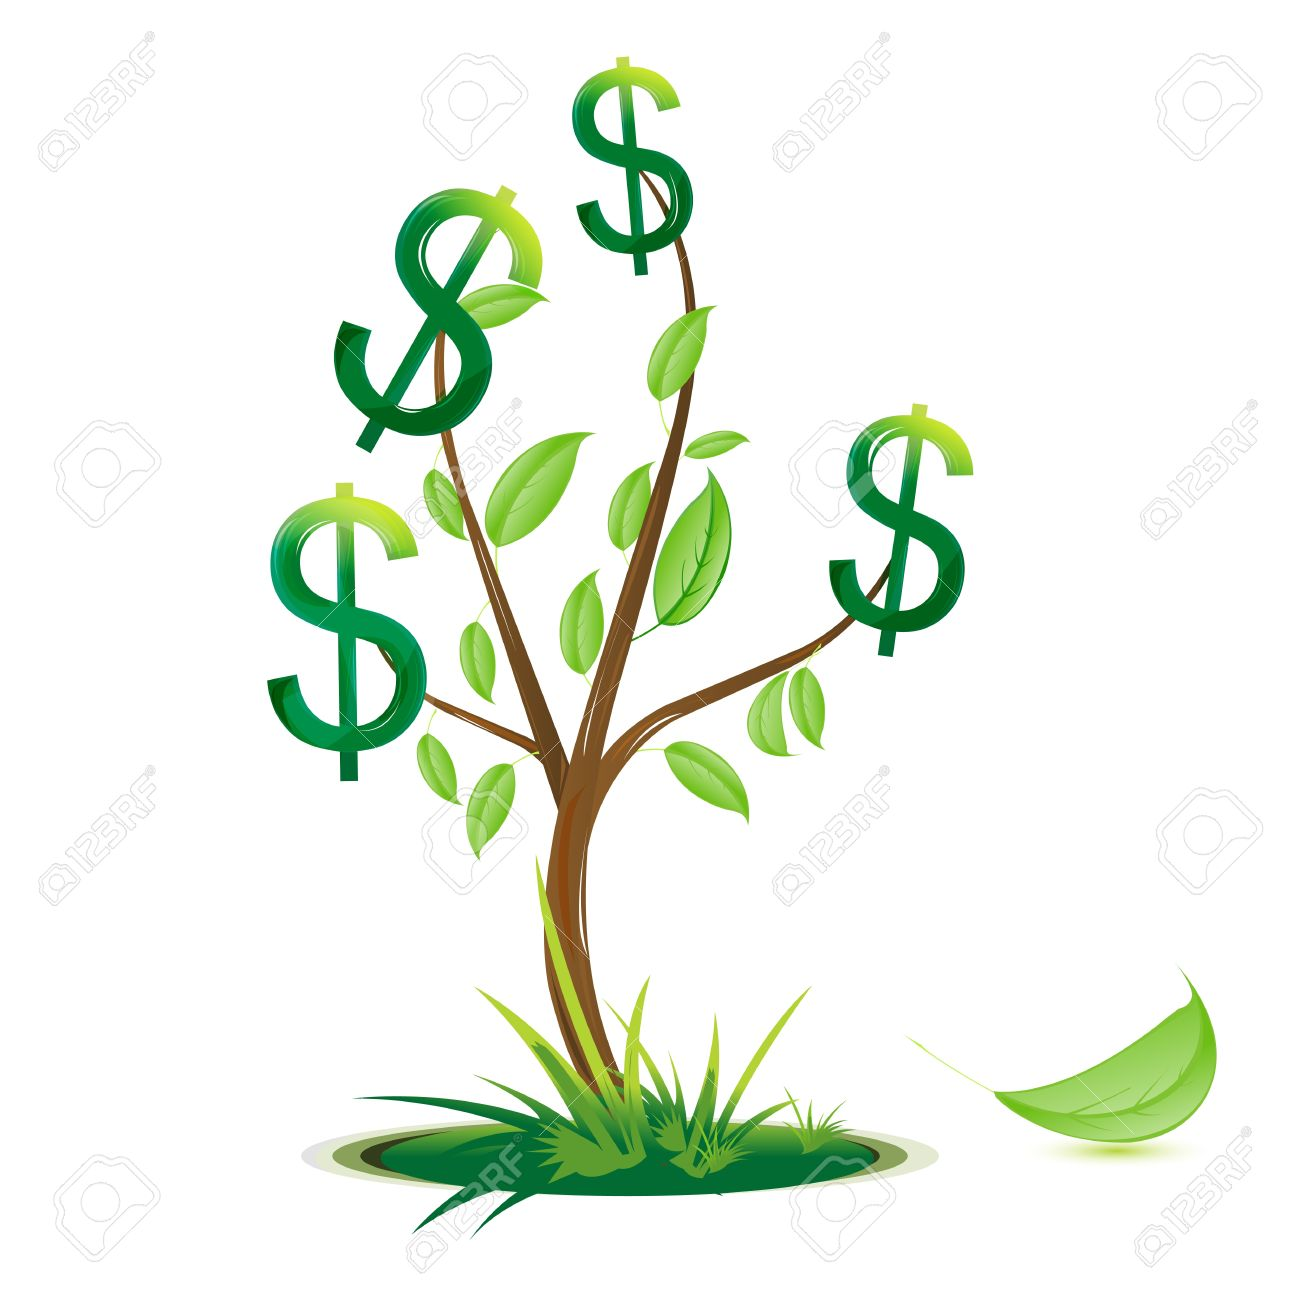 Dollar tree - Vector Illustration Of Dollar Tree On White Background